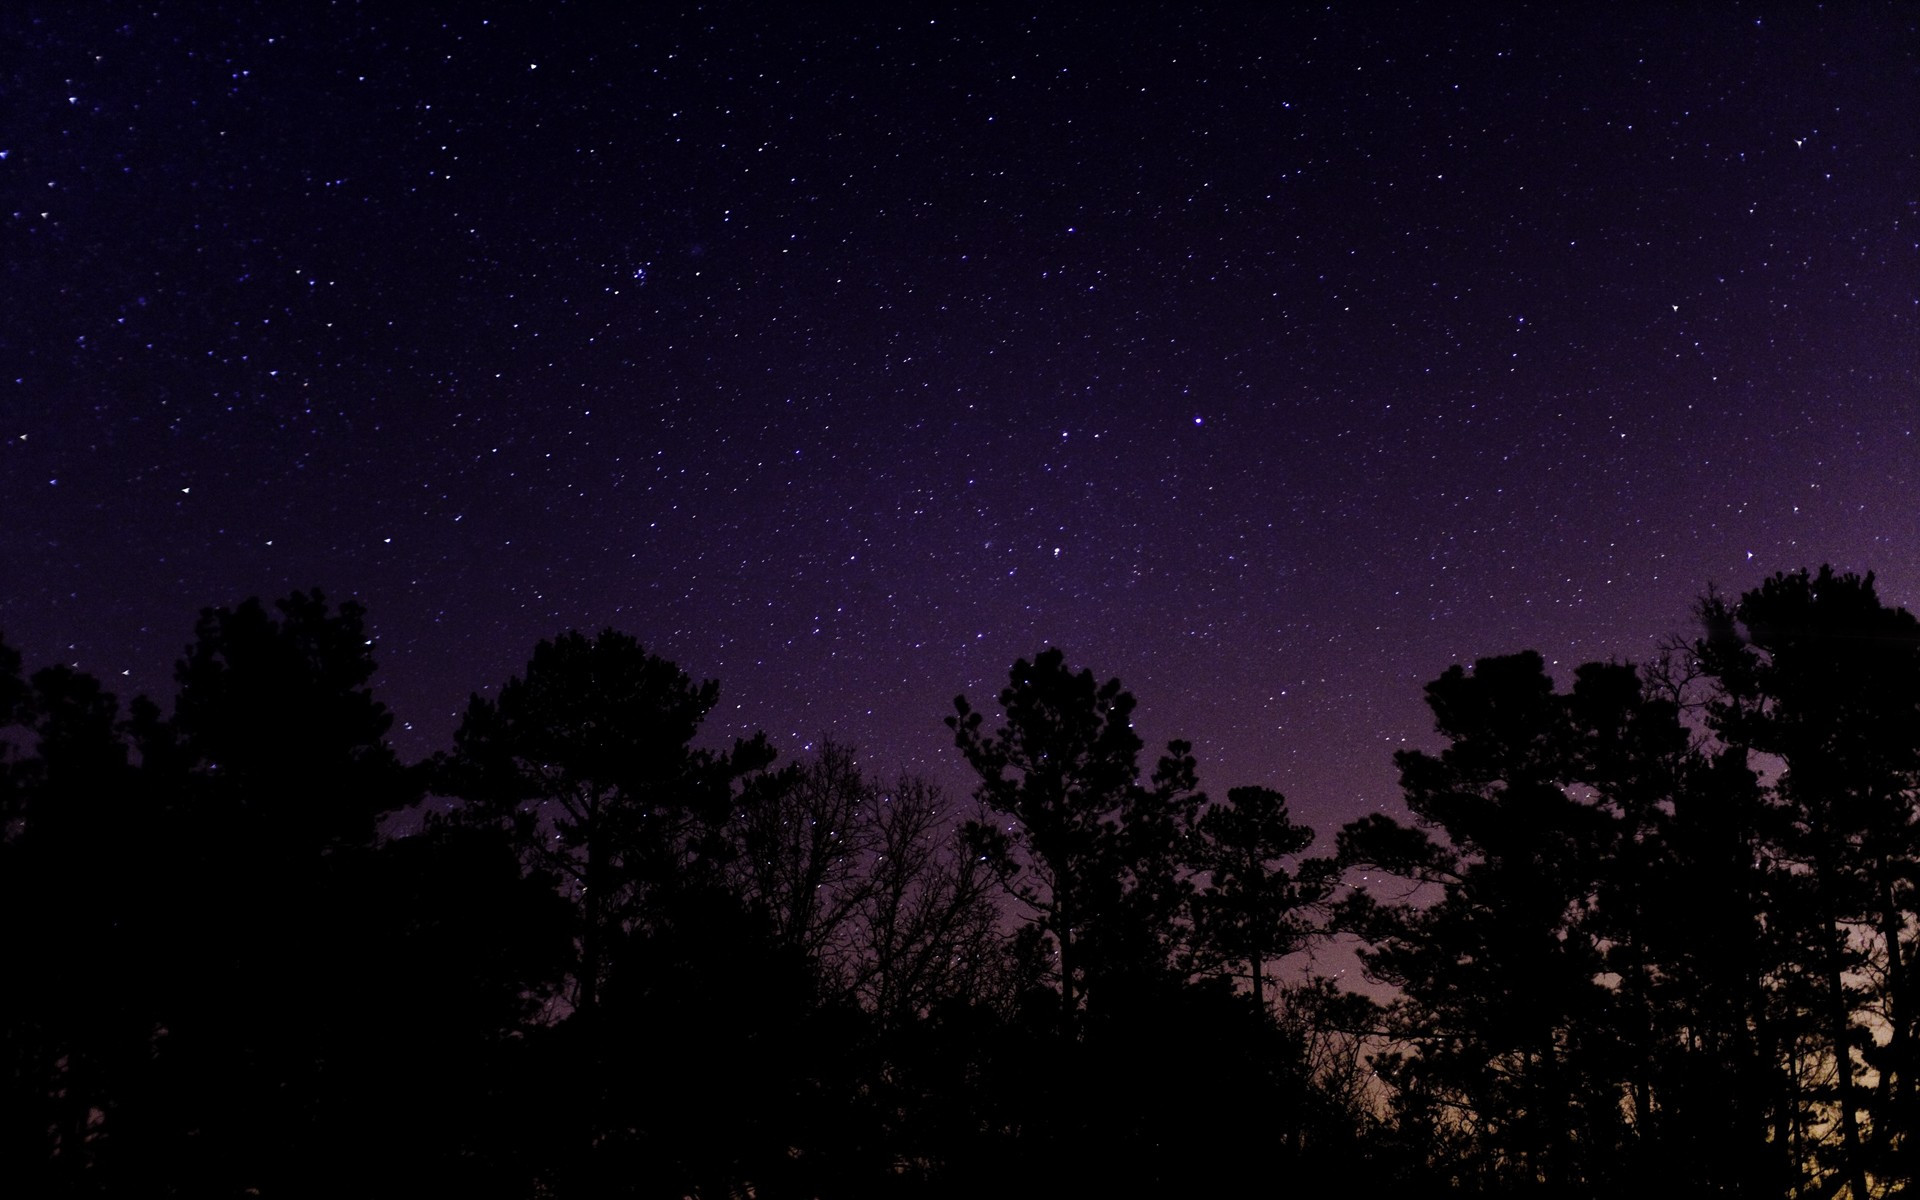 Summer dare: Sleep under the stars: a truly stellar